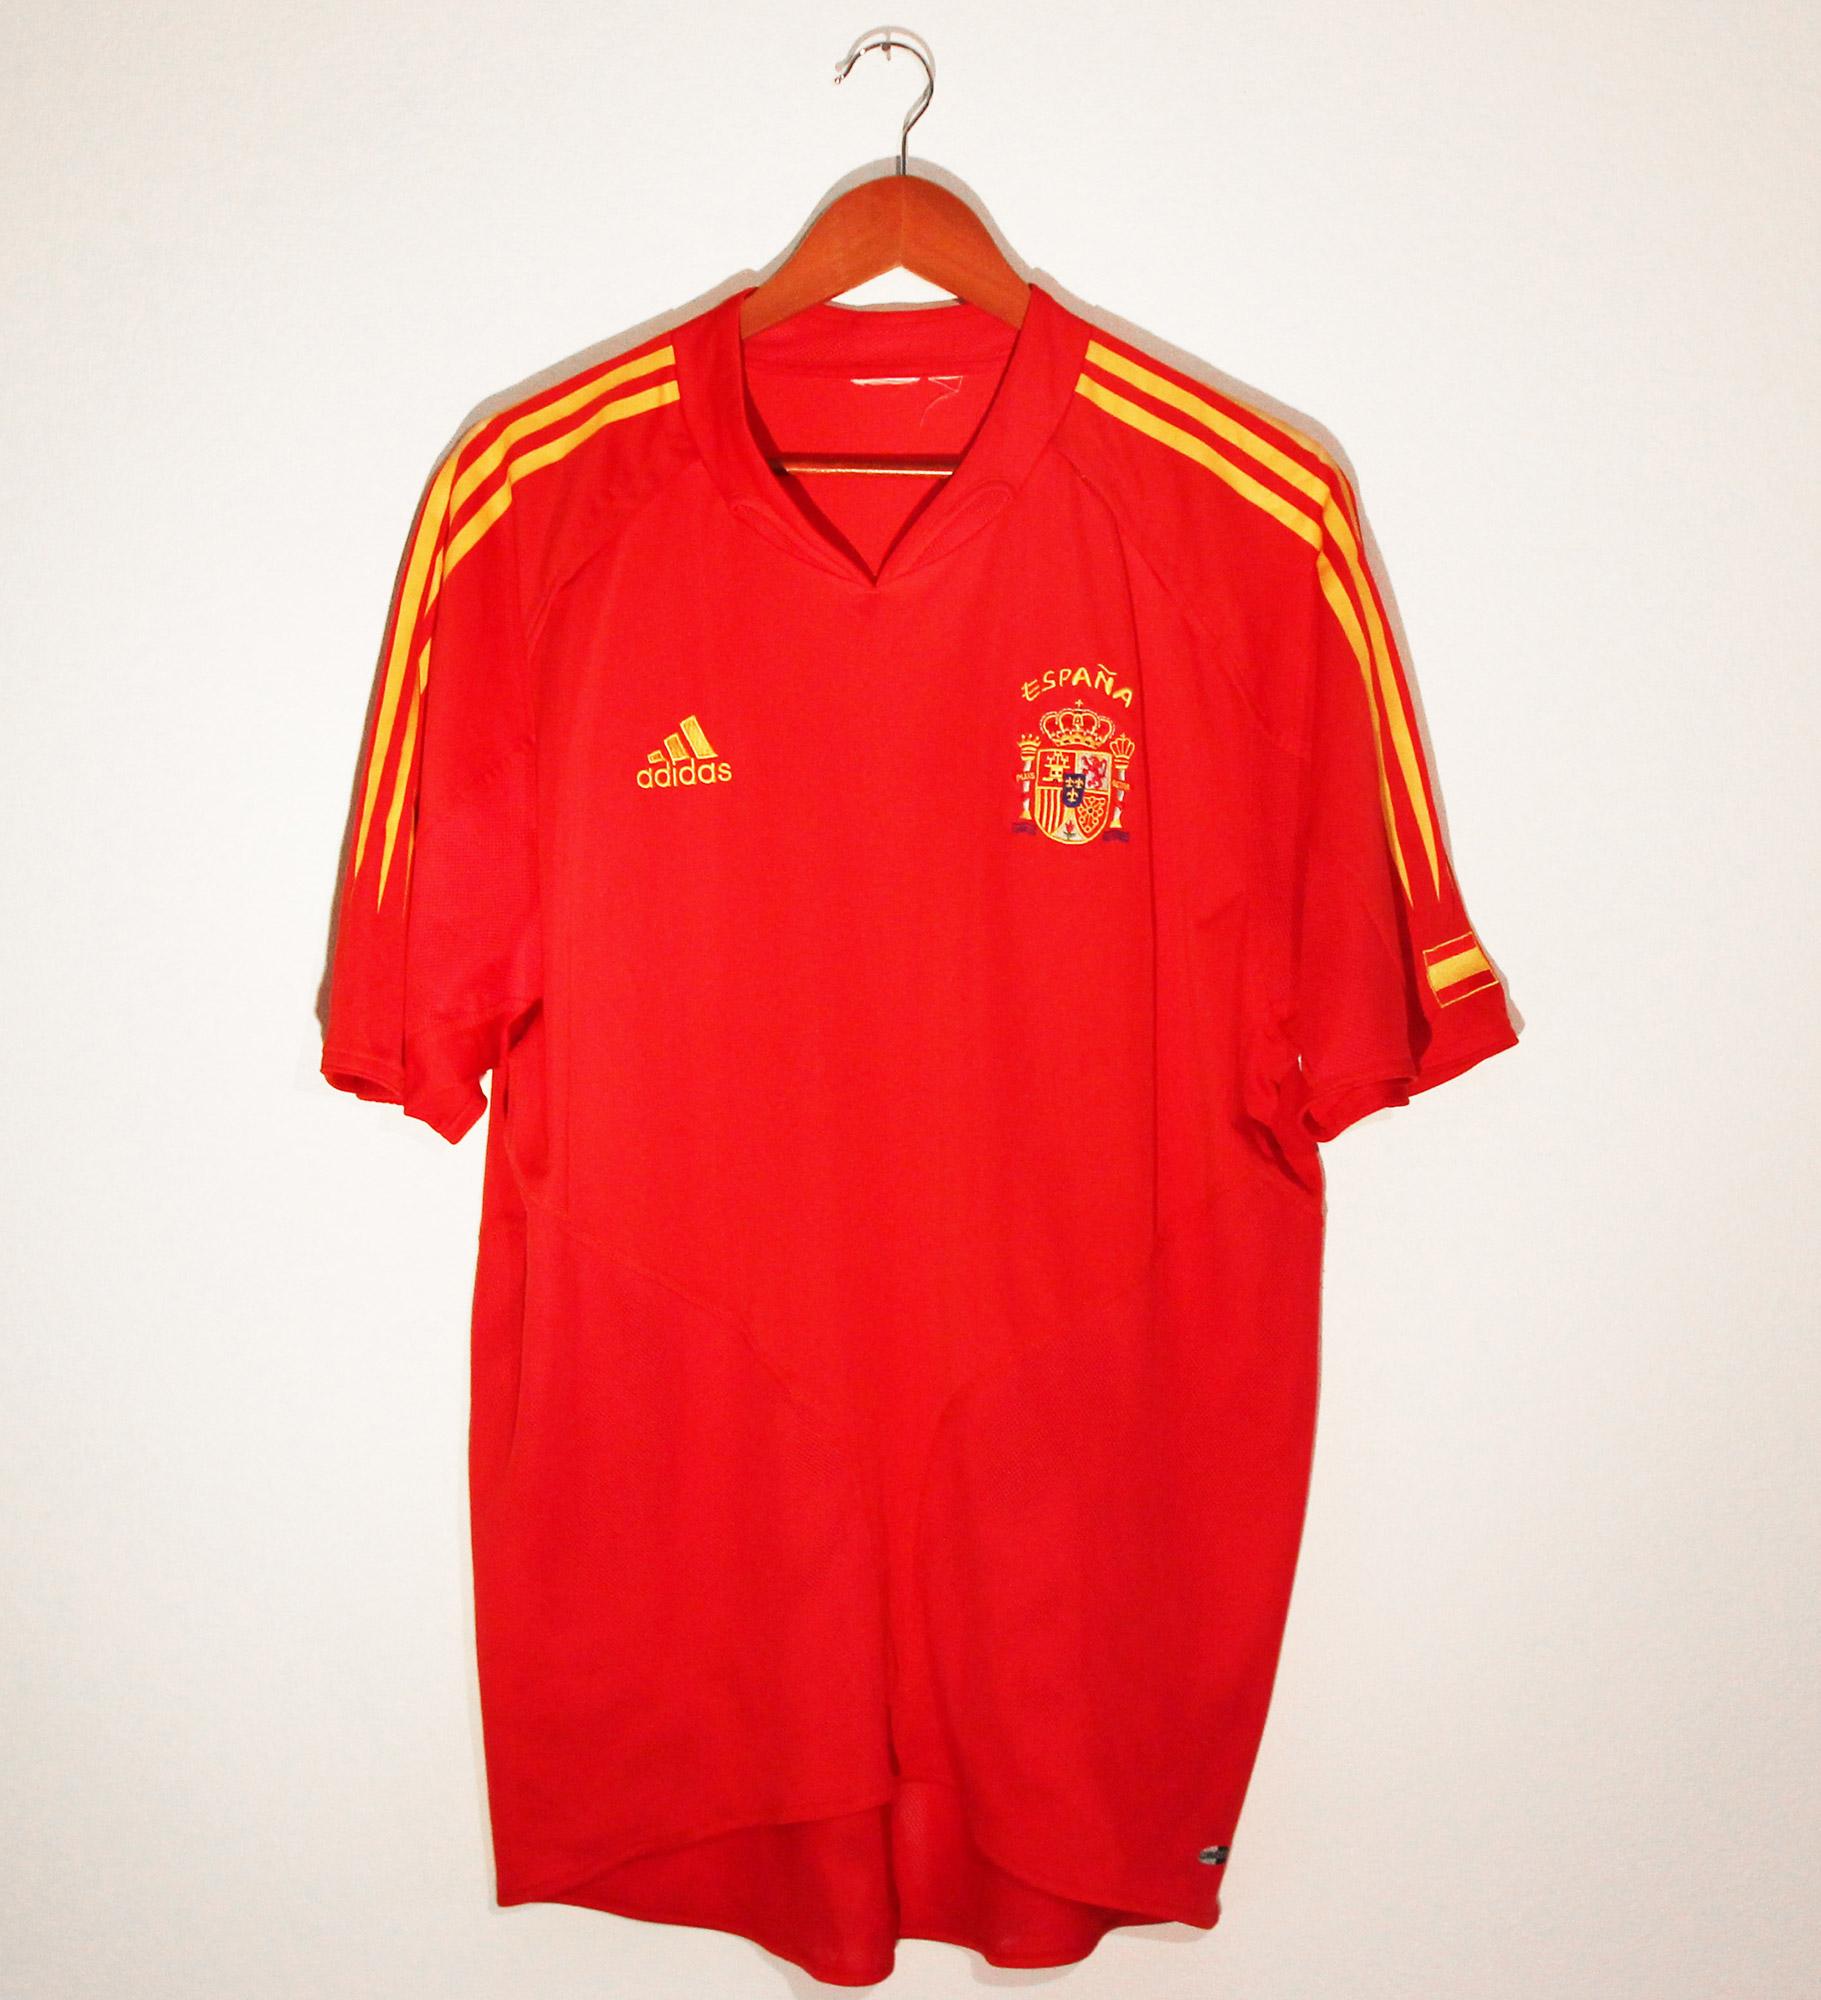 maillot espana rouge 2004